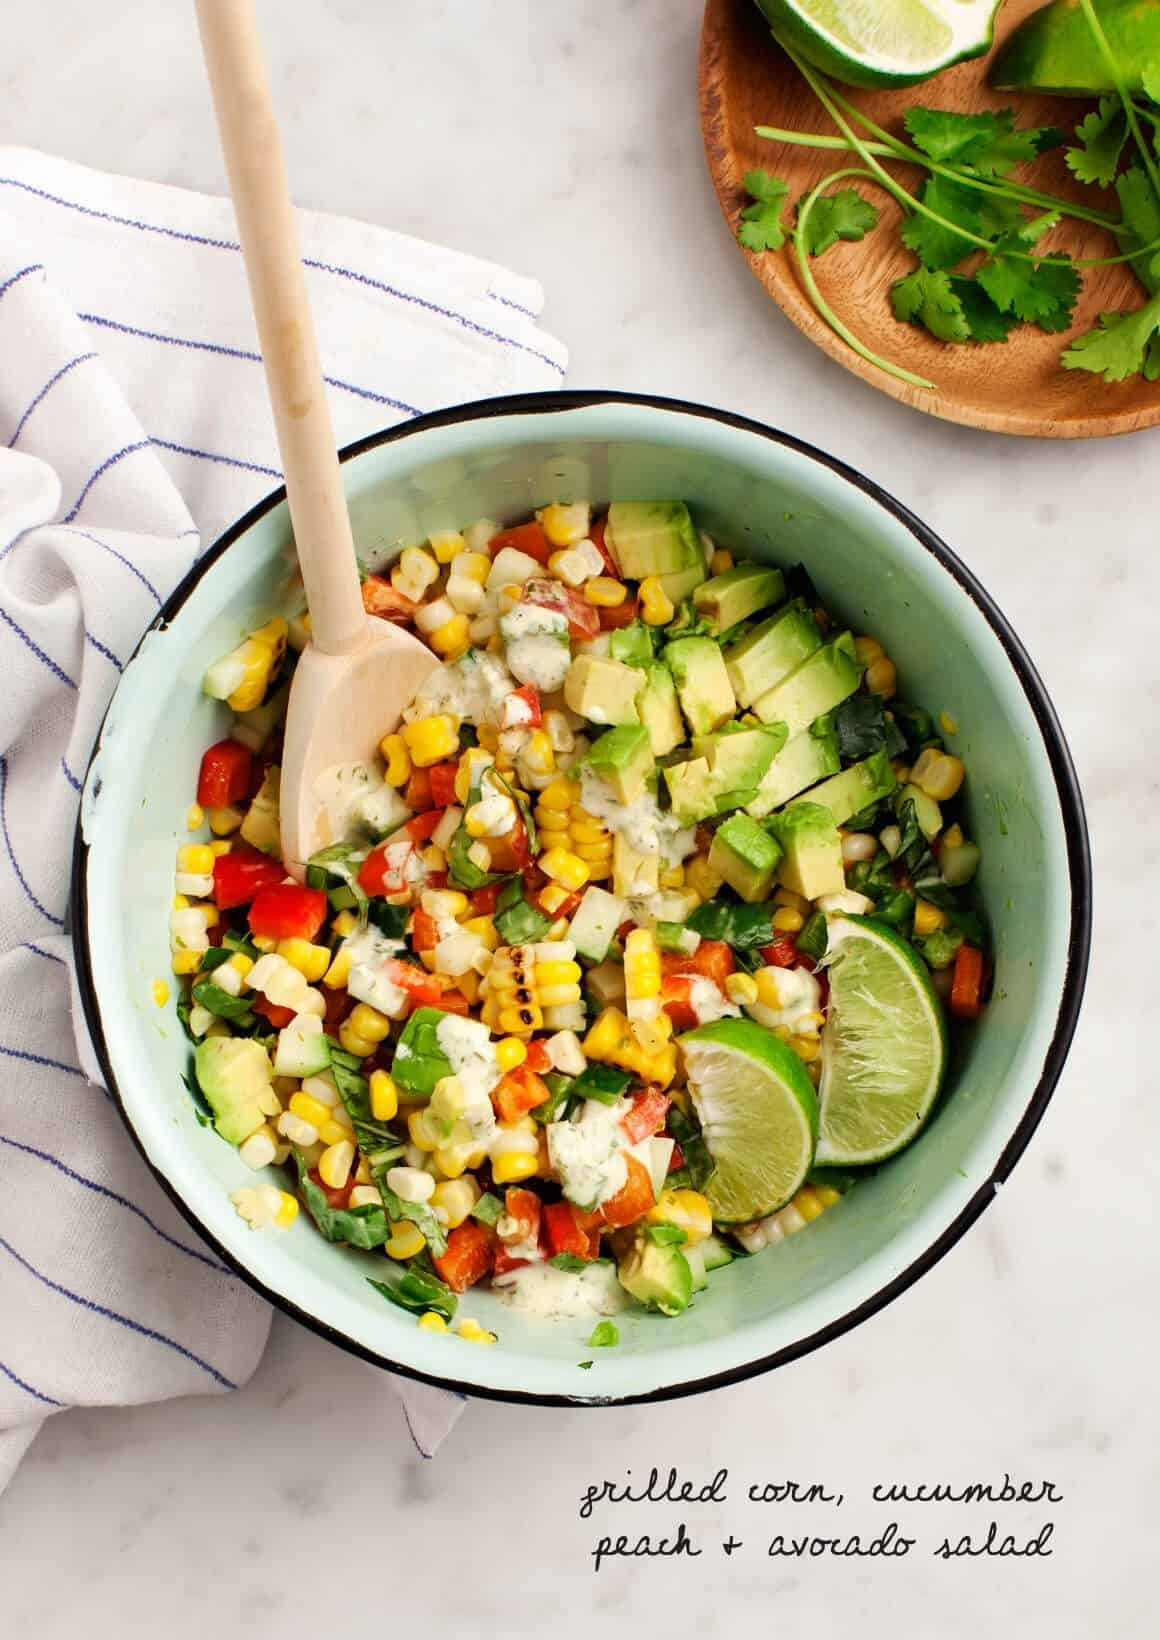 Sweet Corn Recipes - Love and Lemons